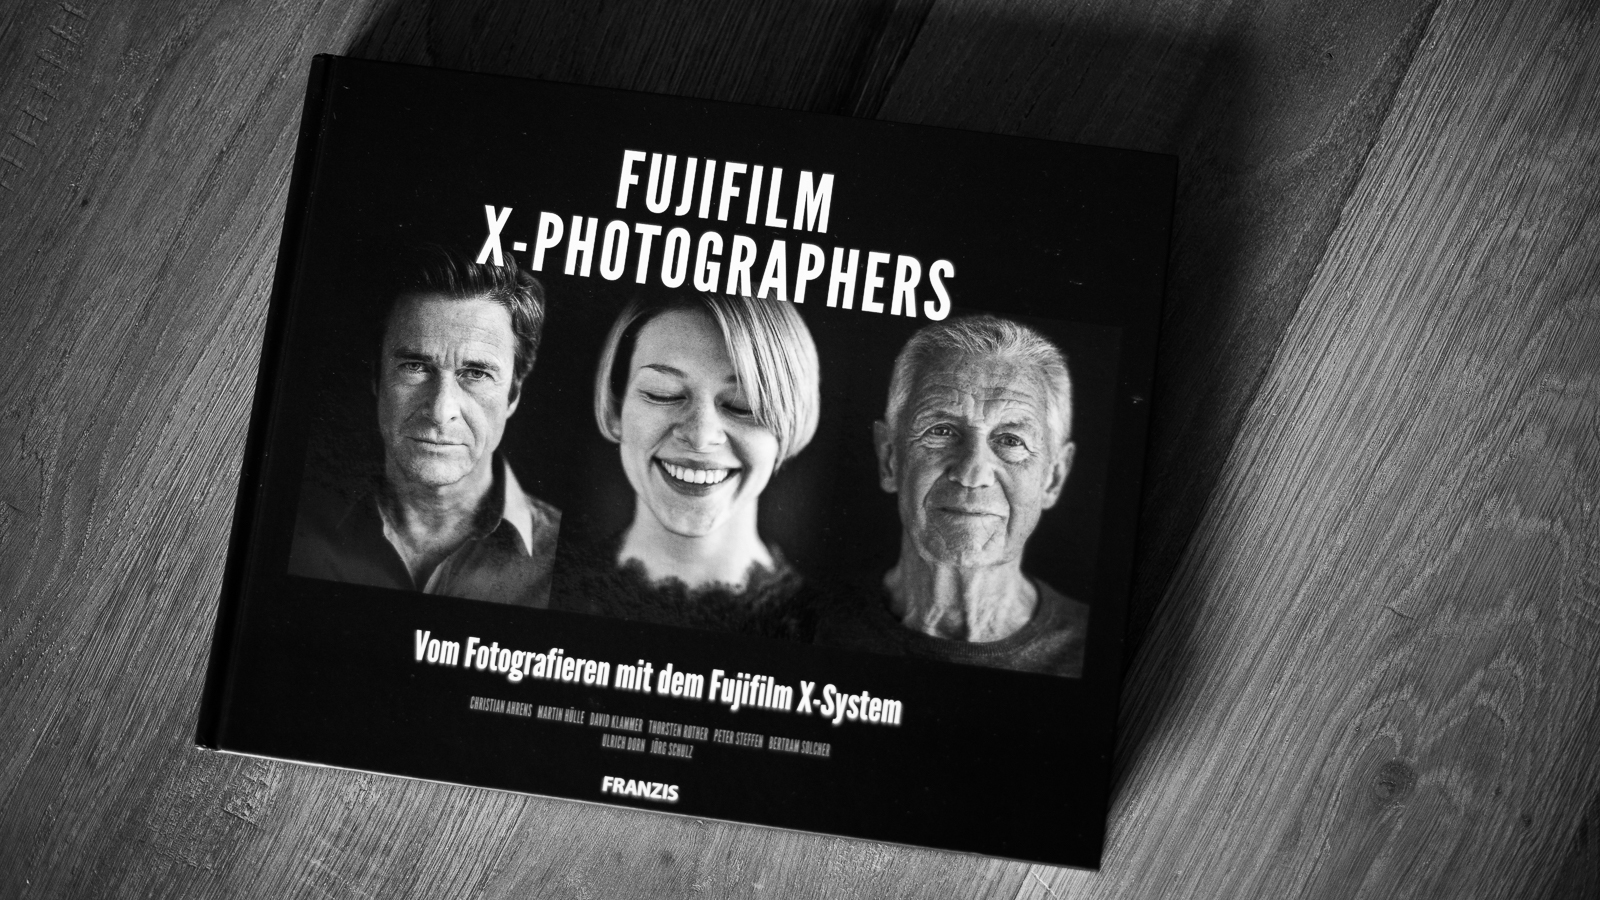 Fachbuch: Fujifilm X-Photographers